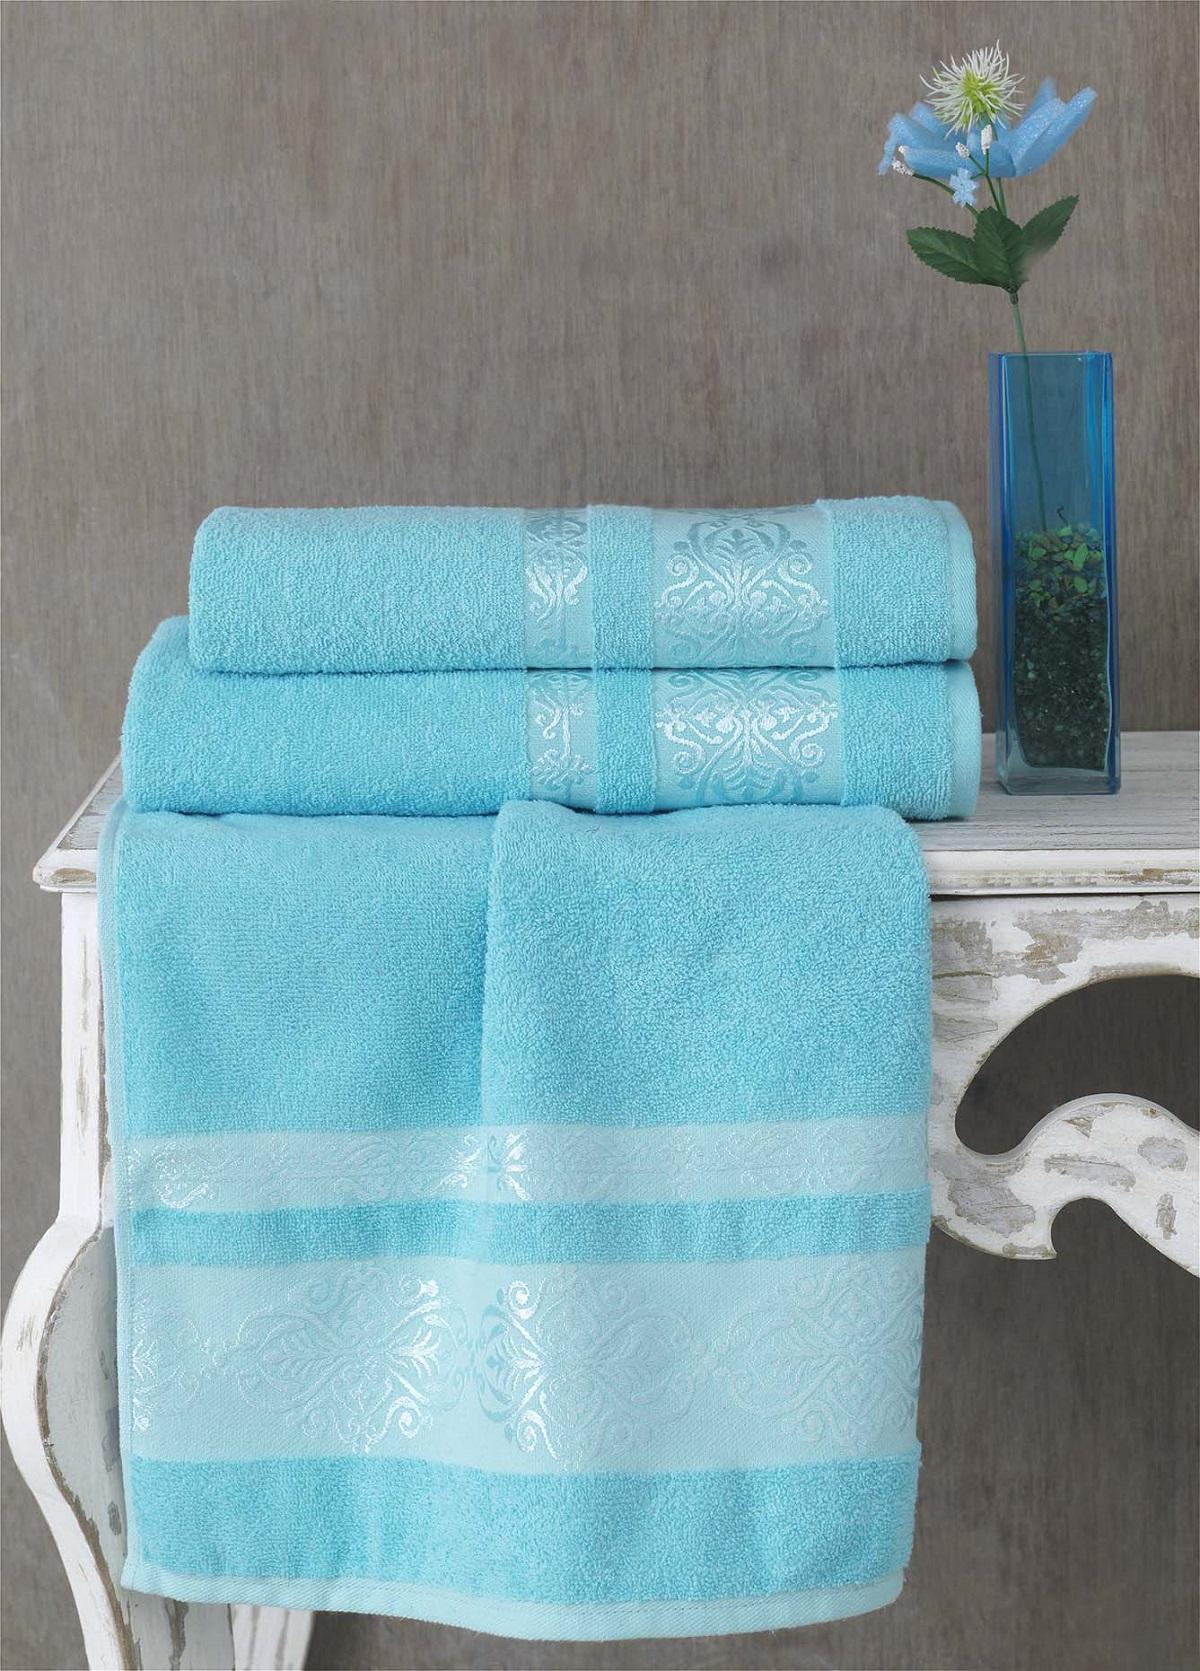 Полотенца Karna Полотенце Rebeka Цвет: Бирюзовый (70х140 см) полотенца karna полотенце iteka цвет коричневый 70х140 см